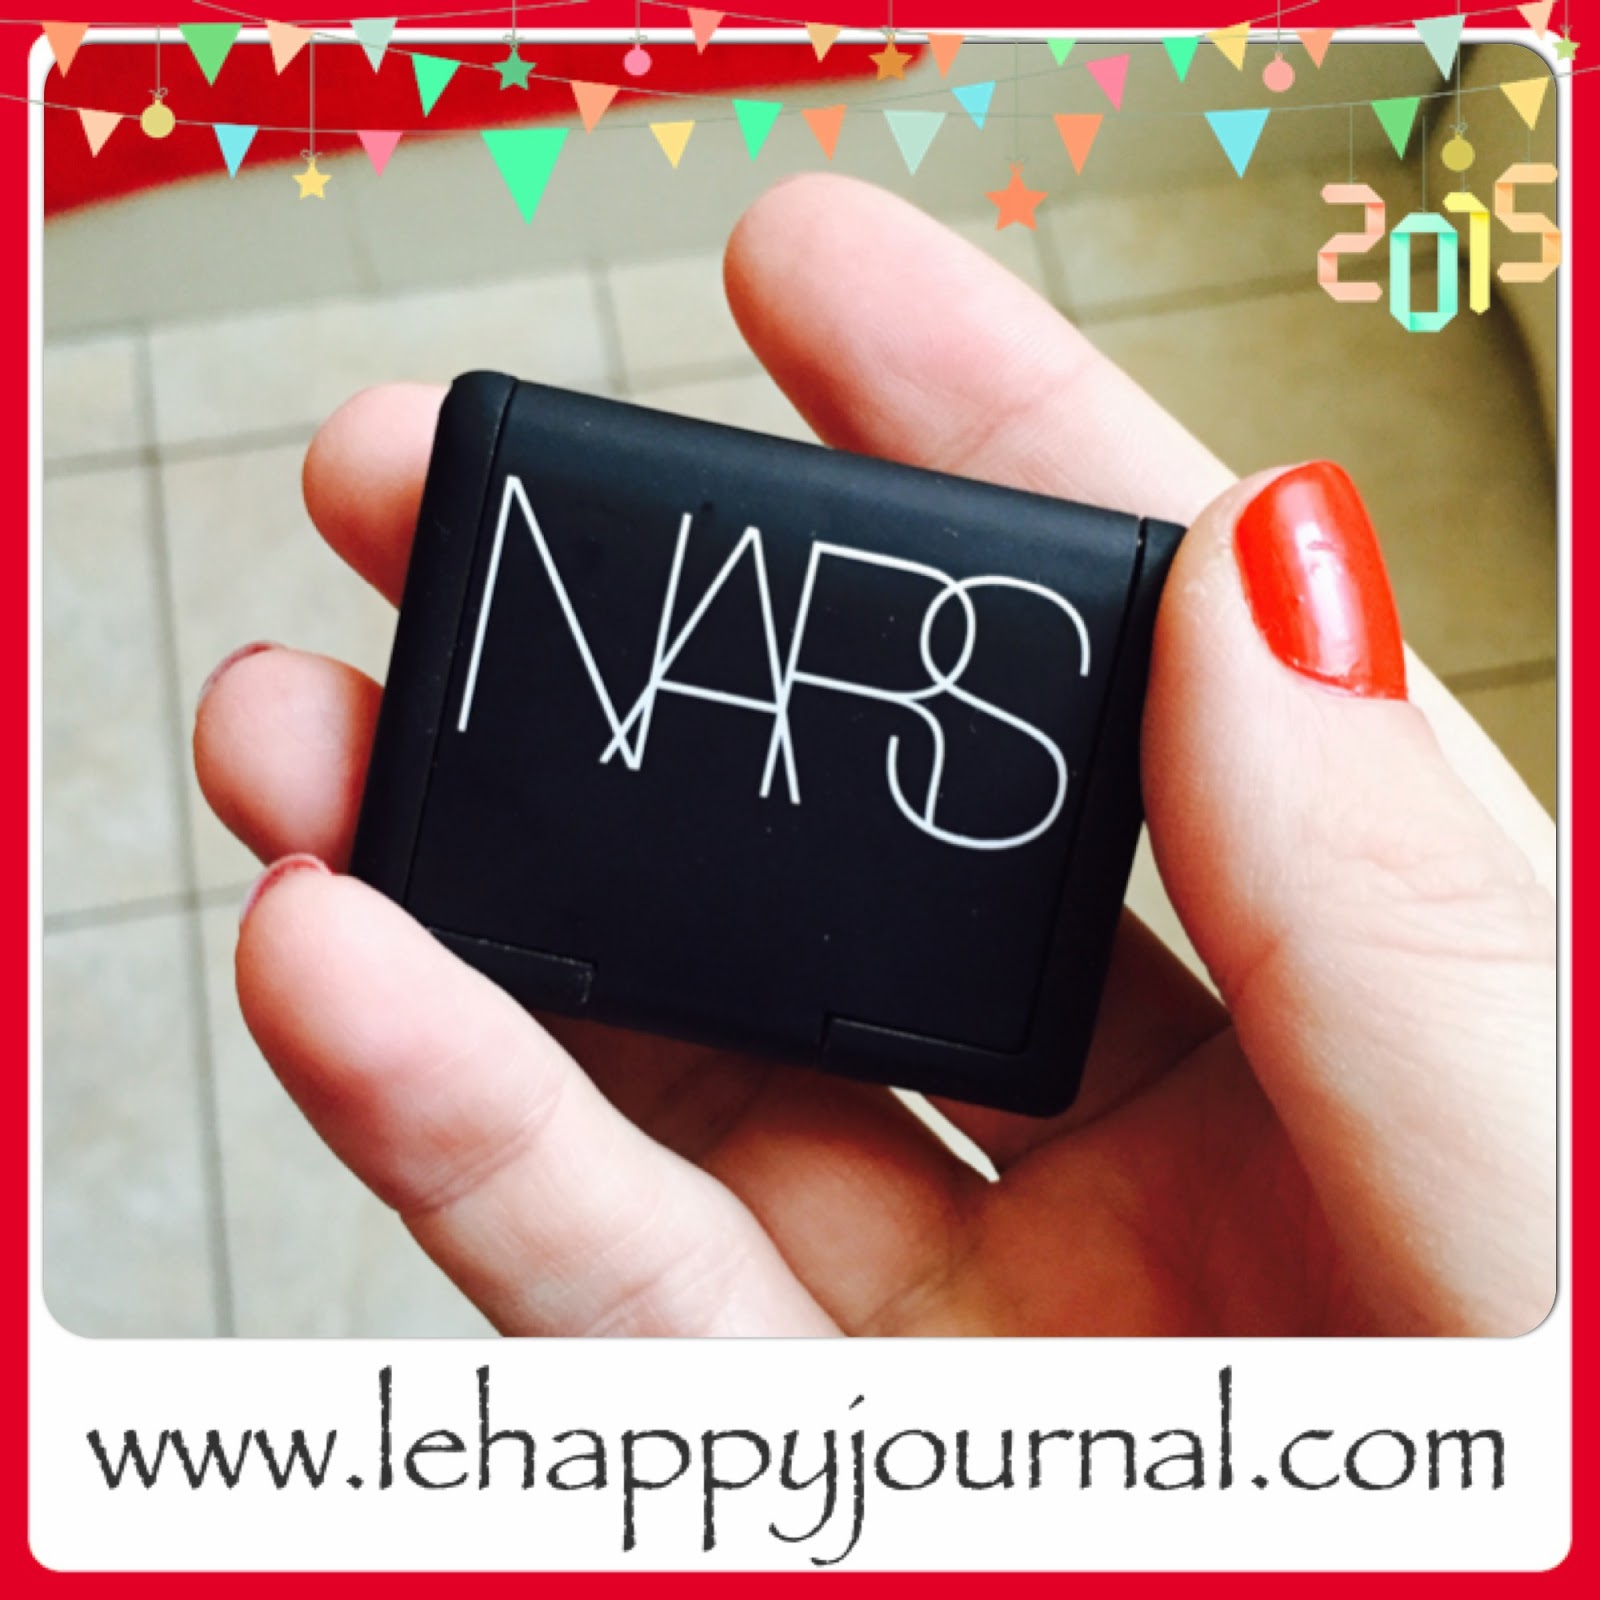 rotation, beauté, produits, semaine 1, revue, blogueuse beauté, opinion, avis, test, happy journal, blush, nars, blush rose, blush nars